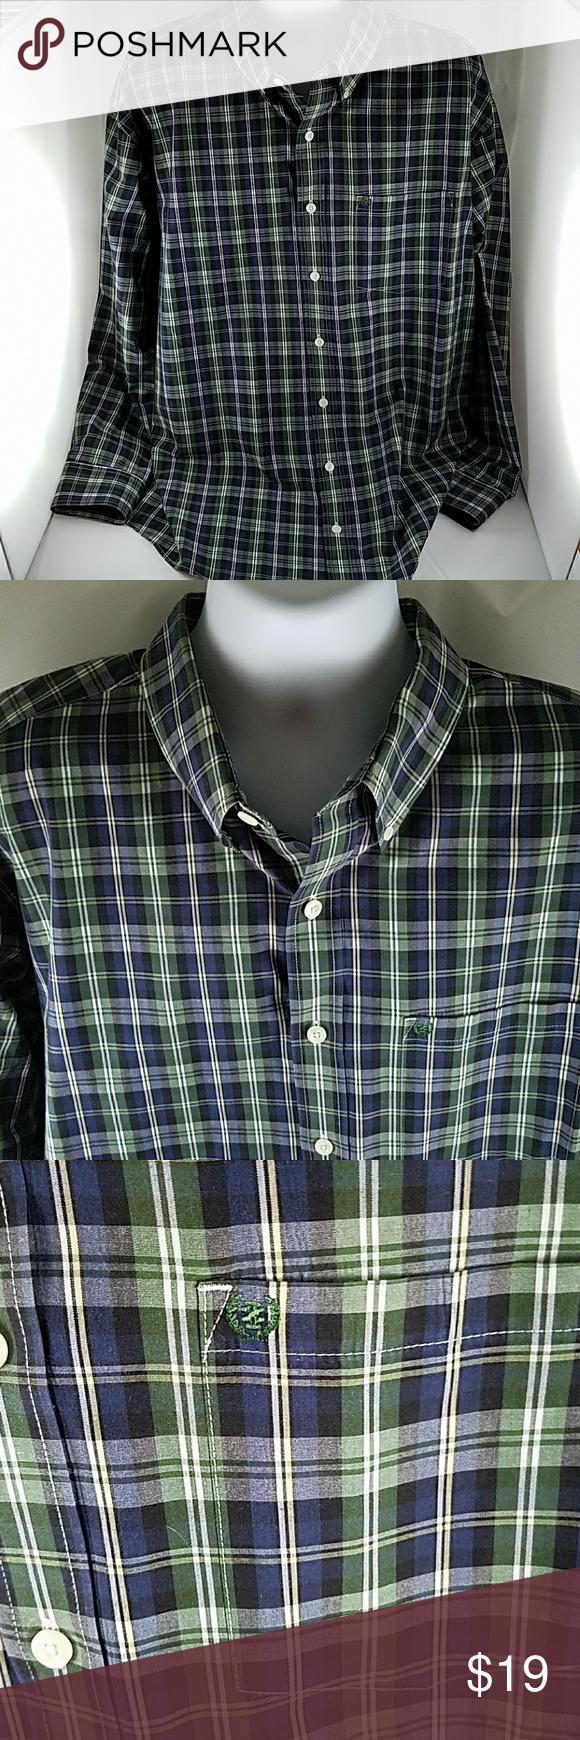 Mens izod green beige white plaid button shirt xl white plaid